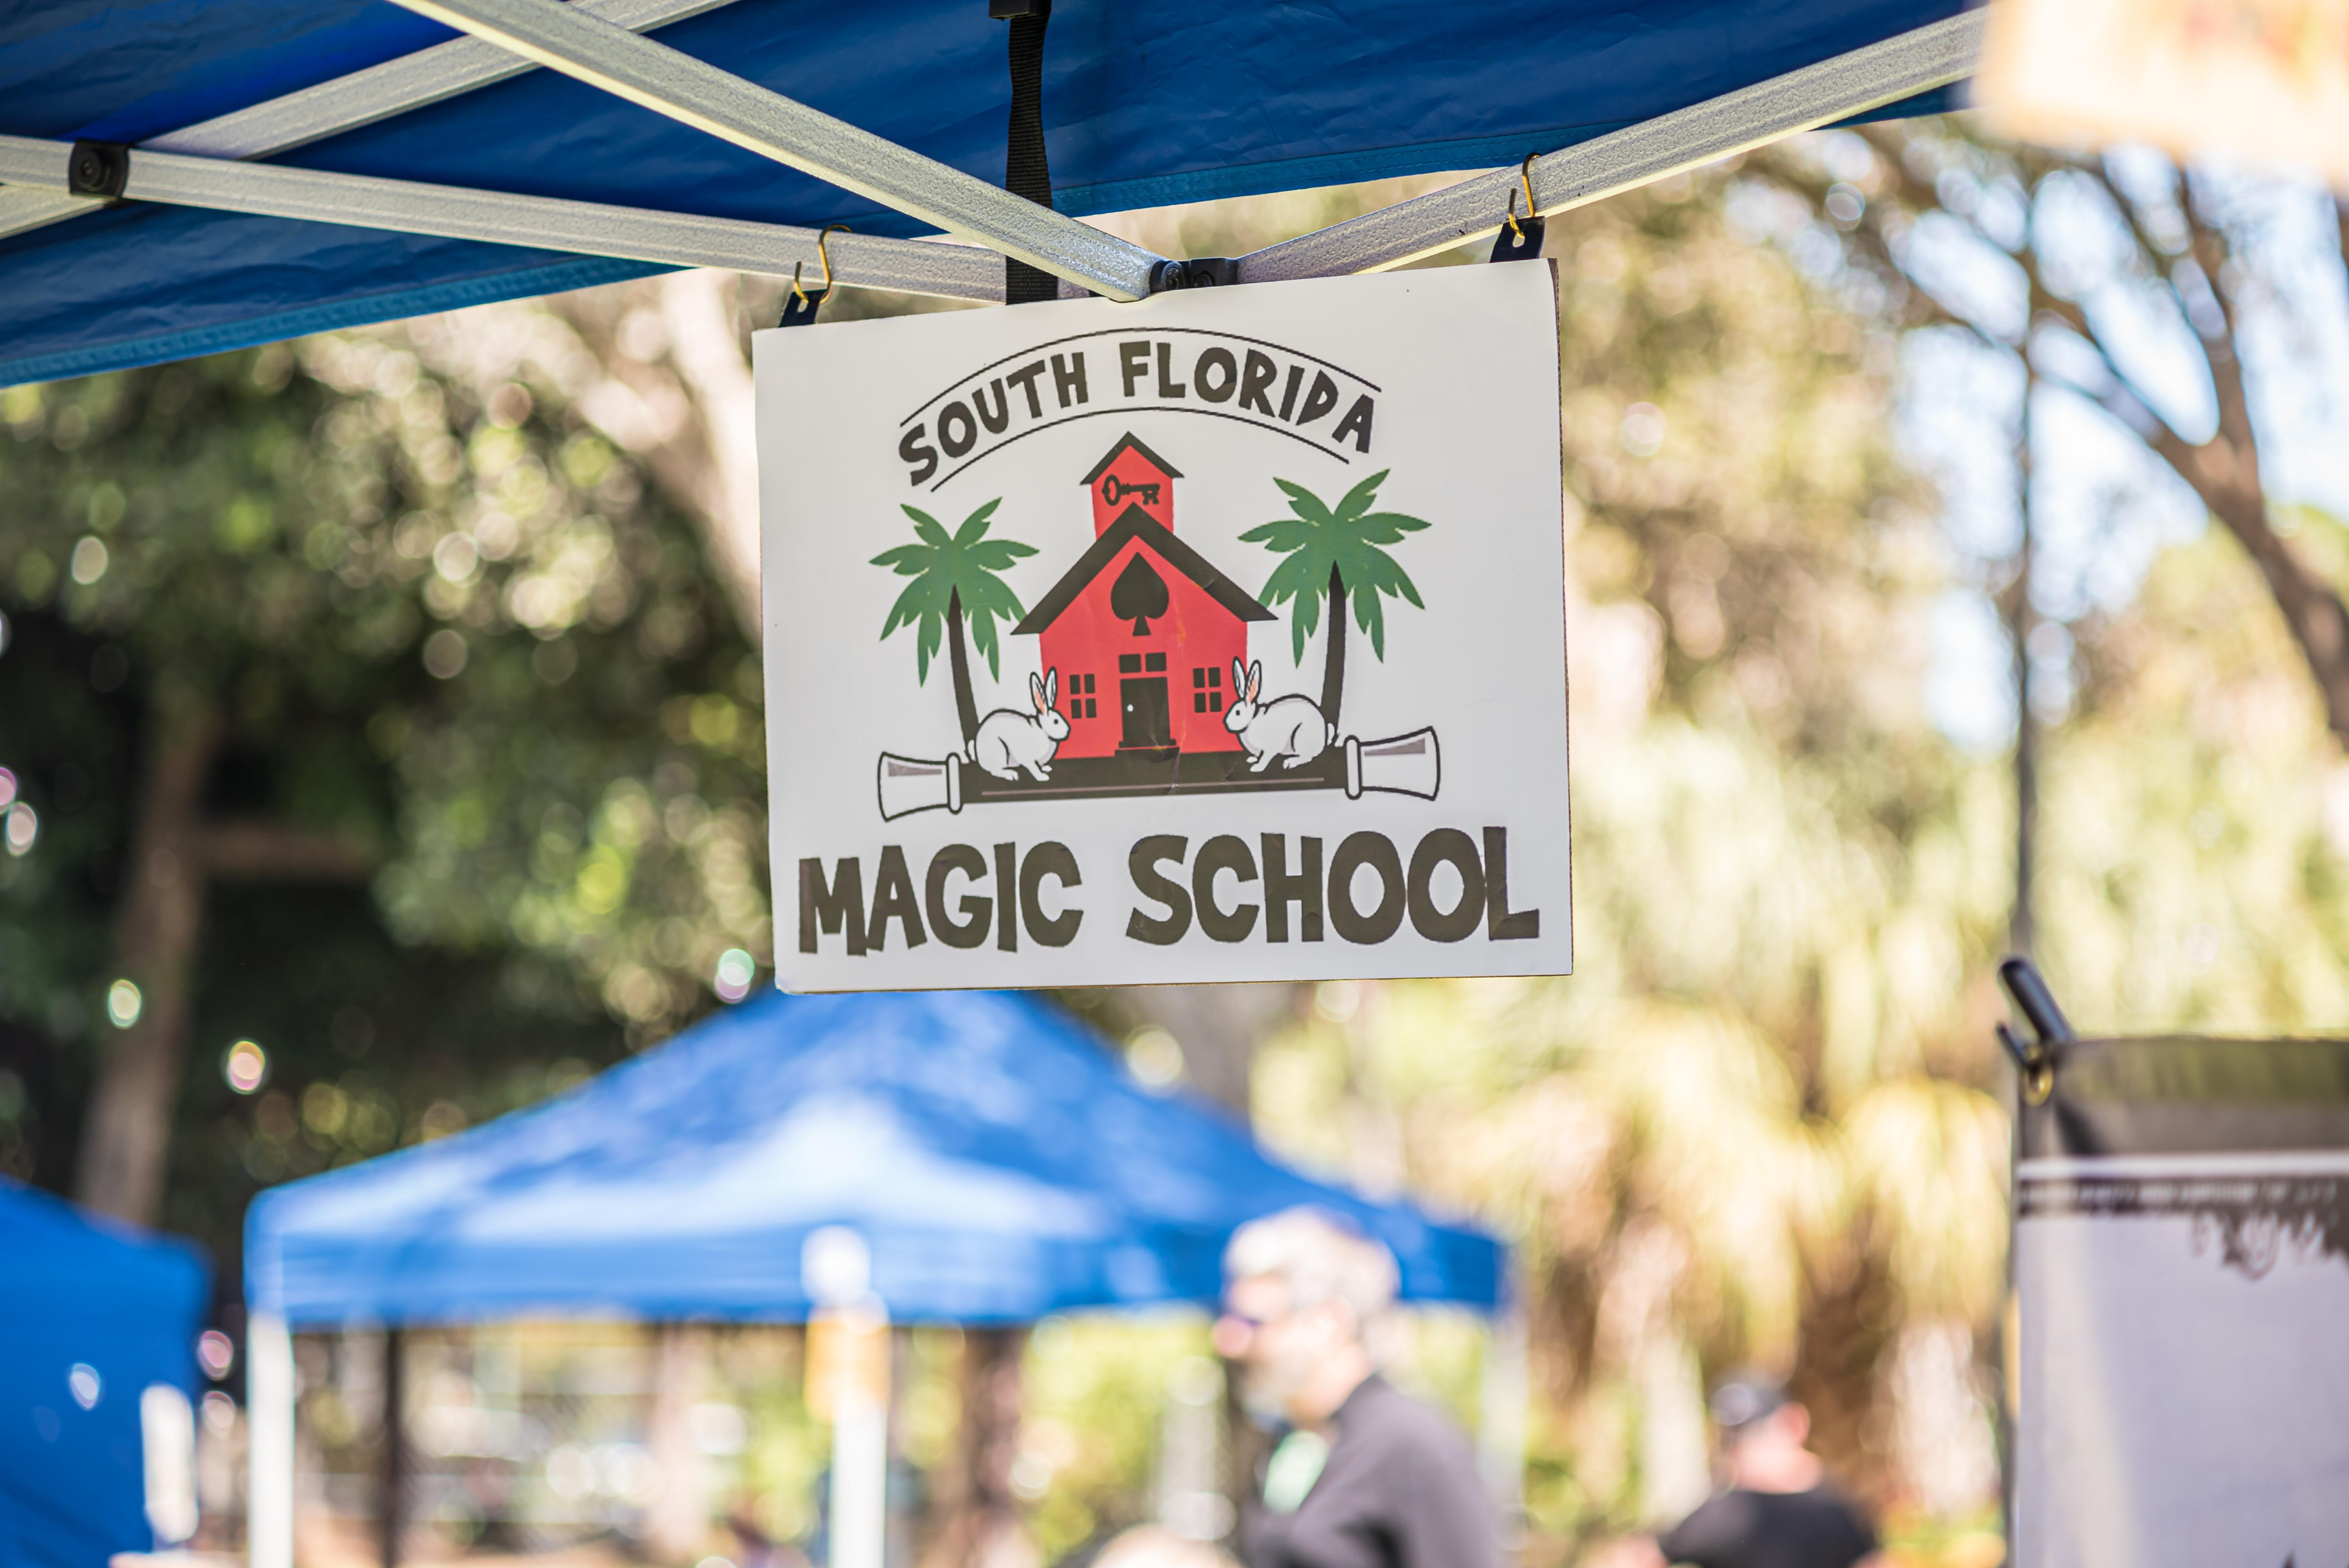 magic school booth